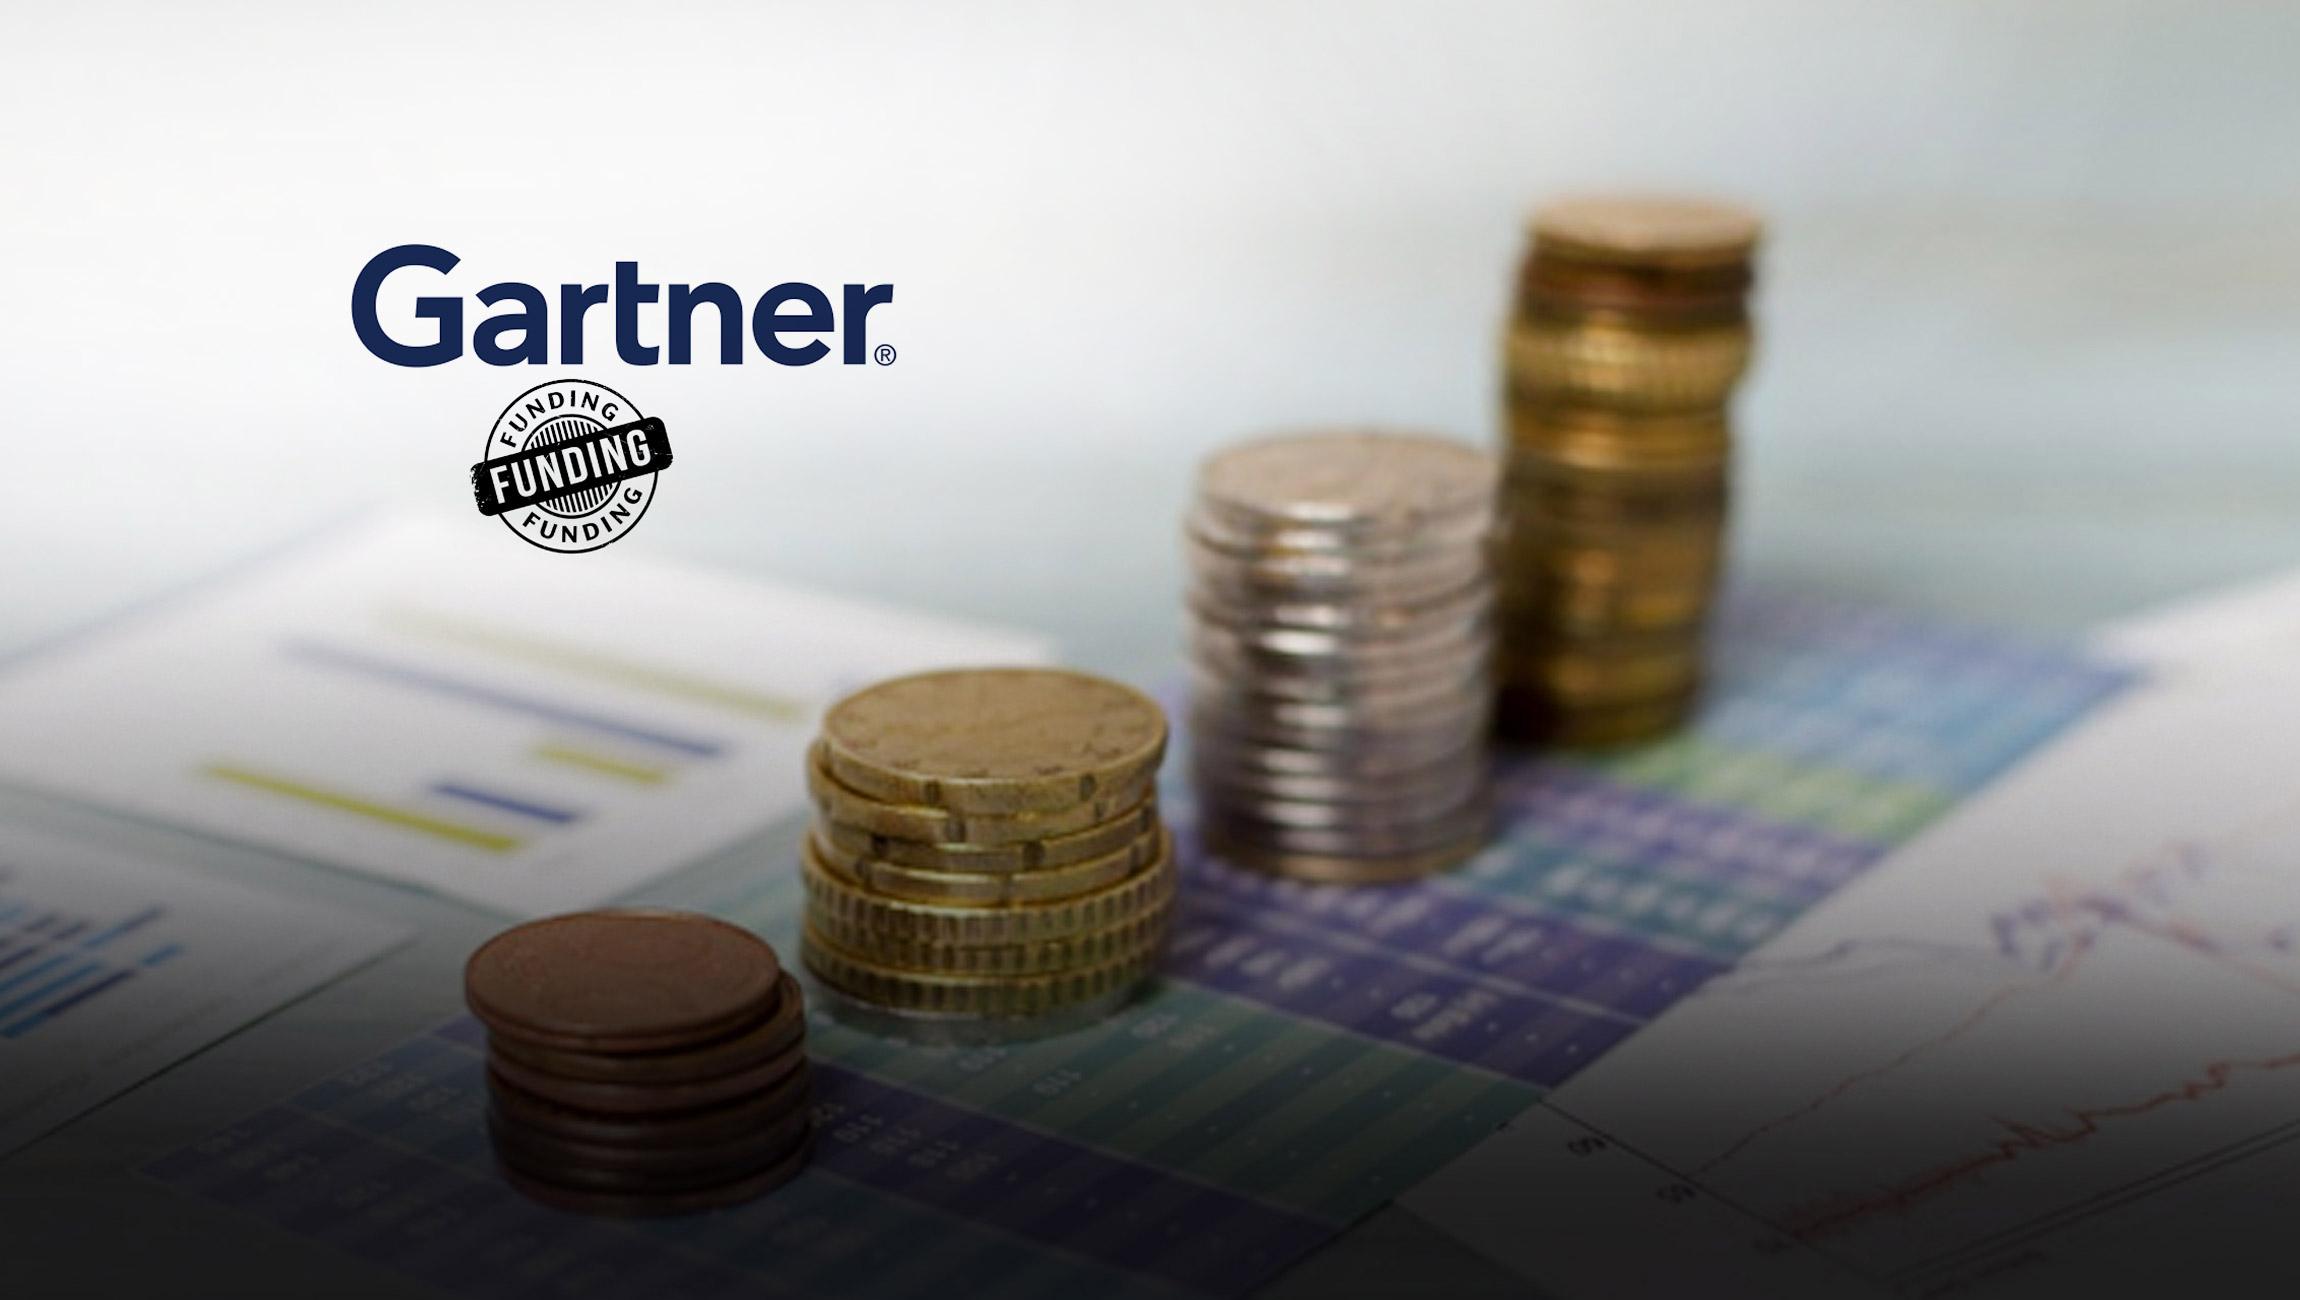 Gartner Forecasts Worldwide IT Spending To Reach $4 Trillion In 2021